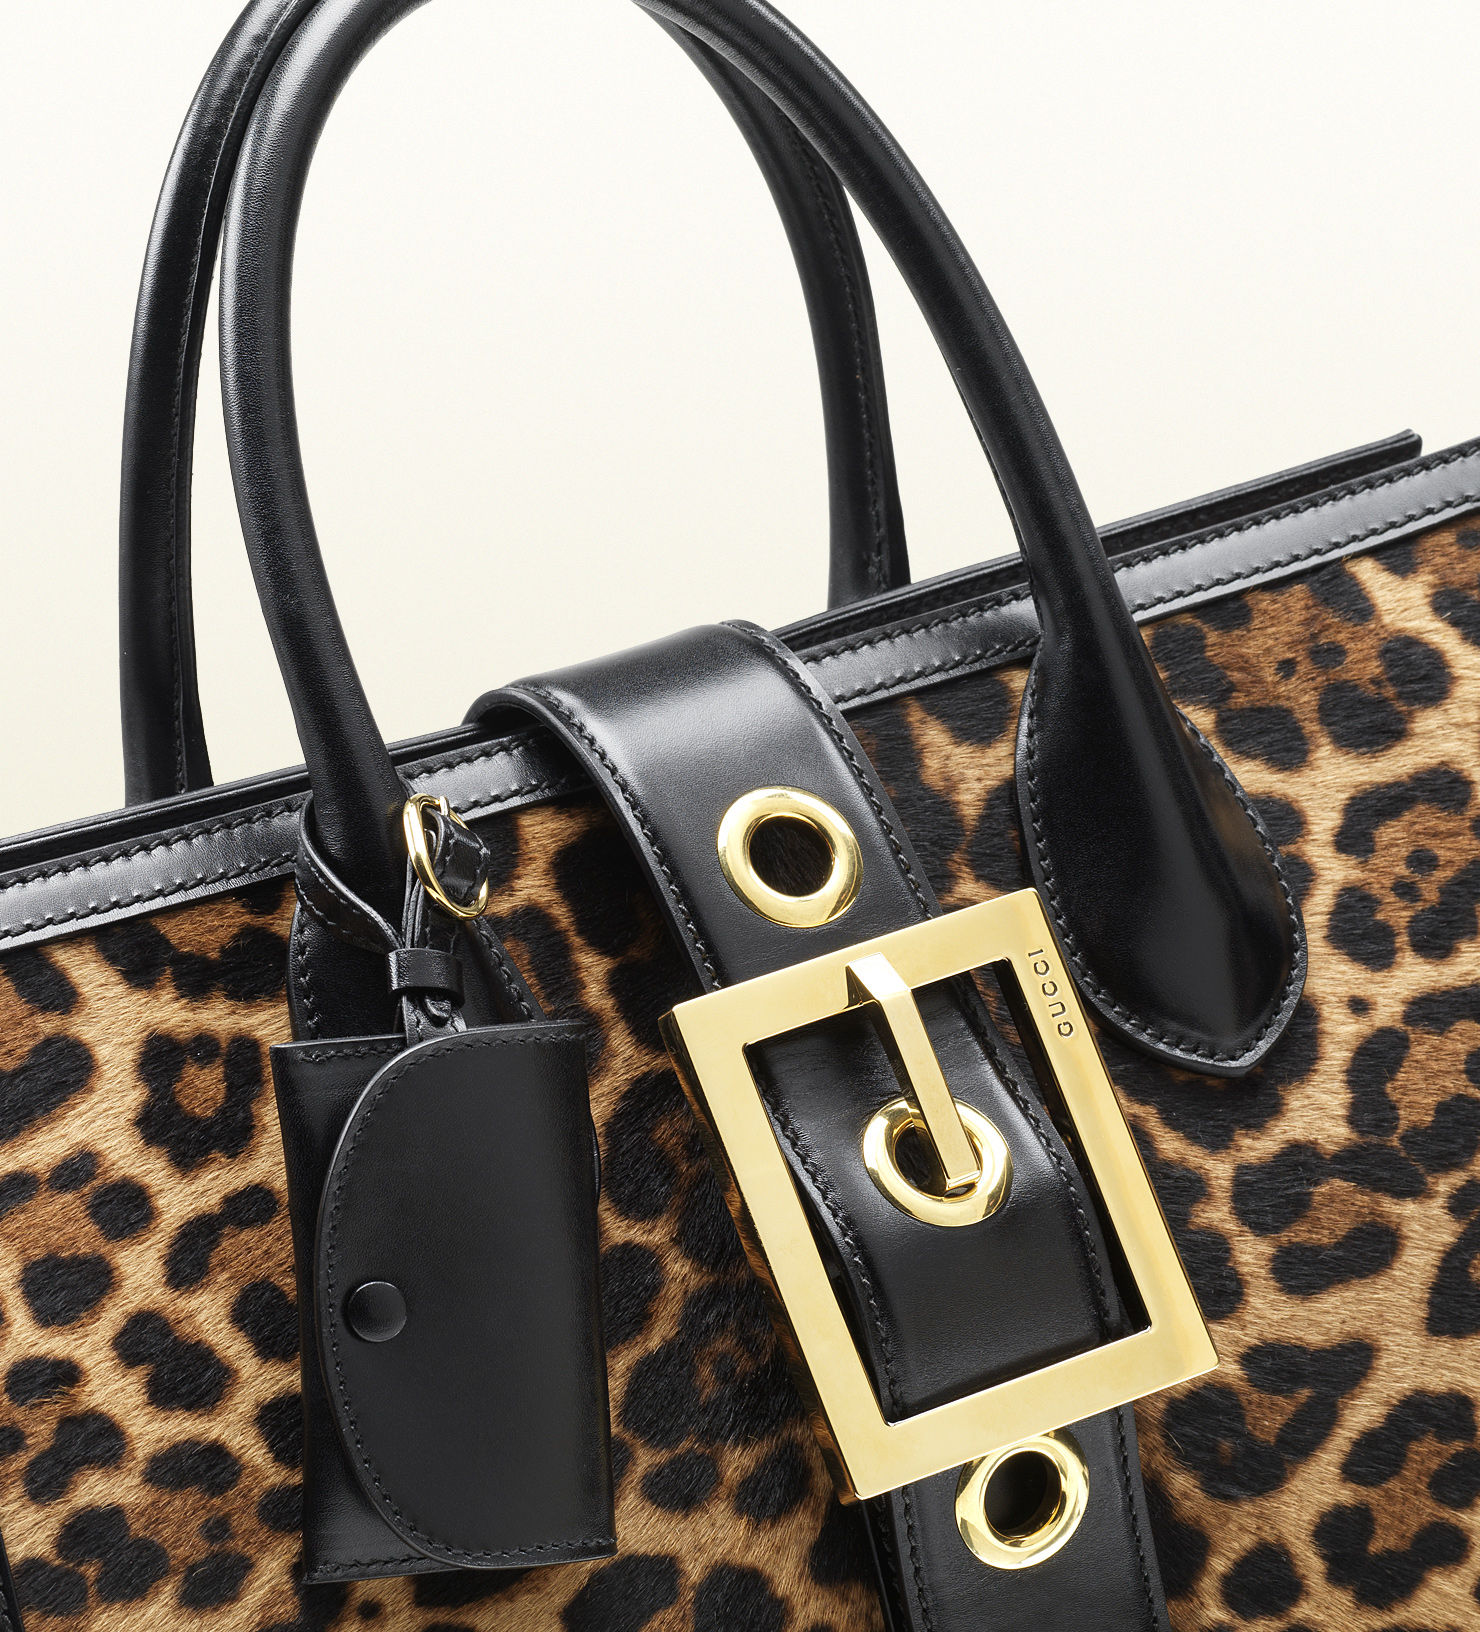 handbags print veg fannypack belt jaguar fanny black fp w pack products back